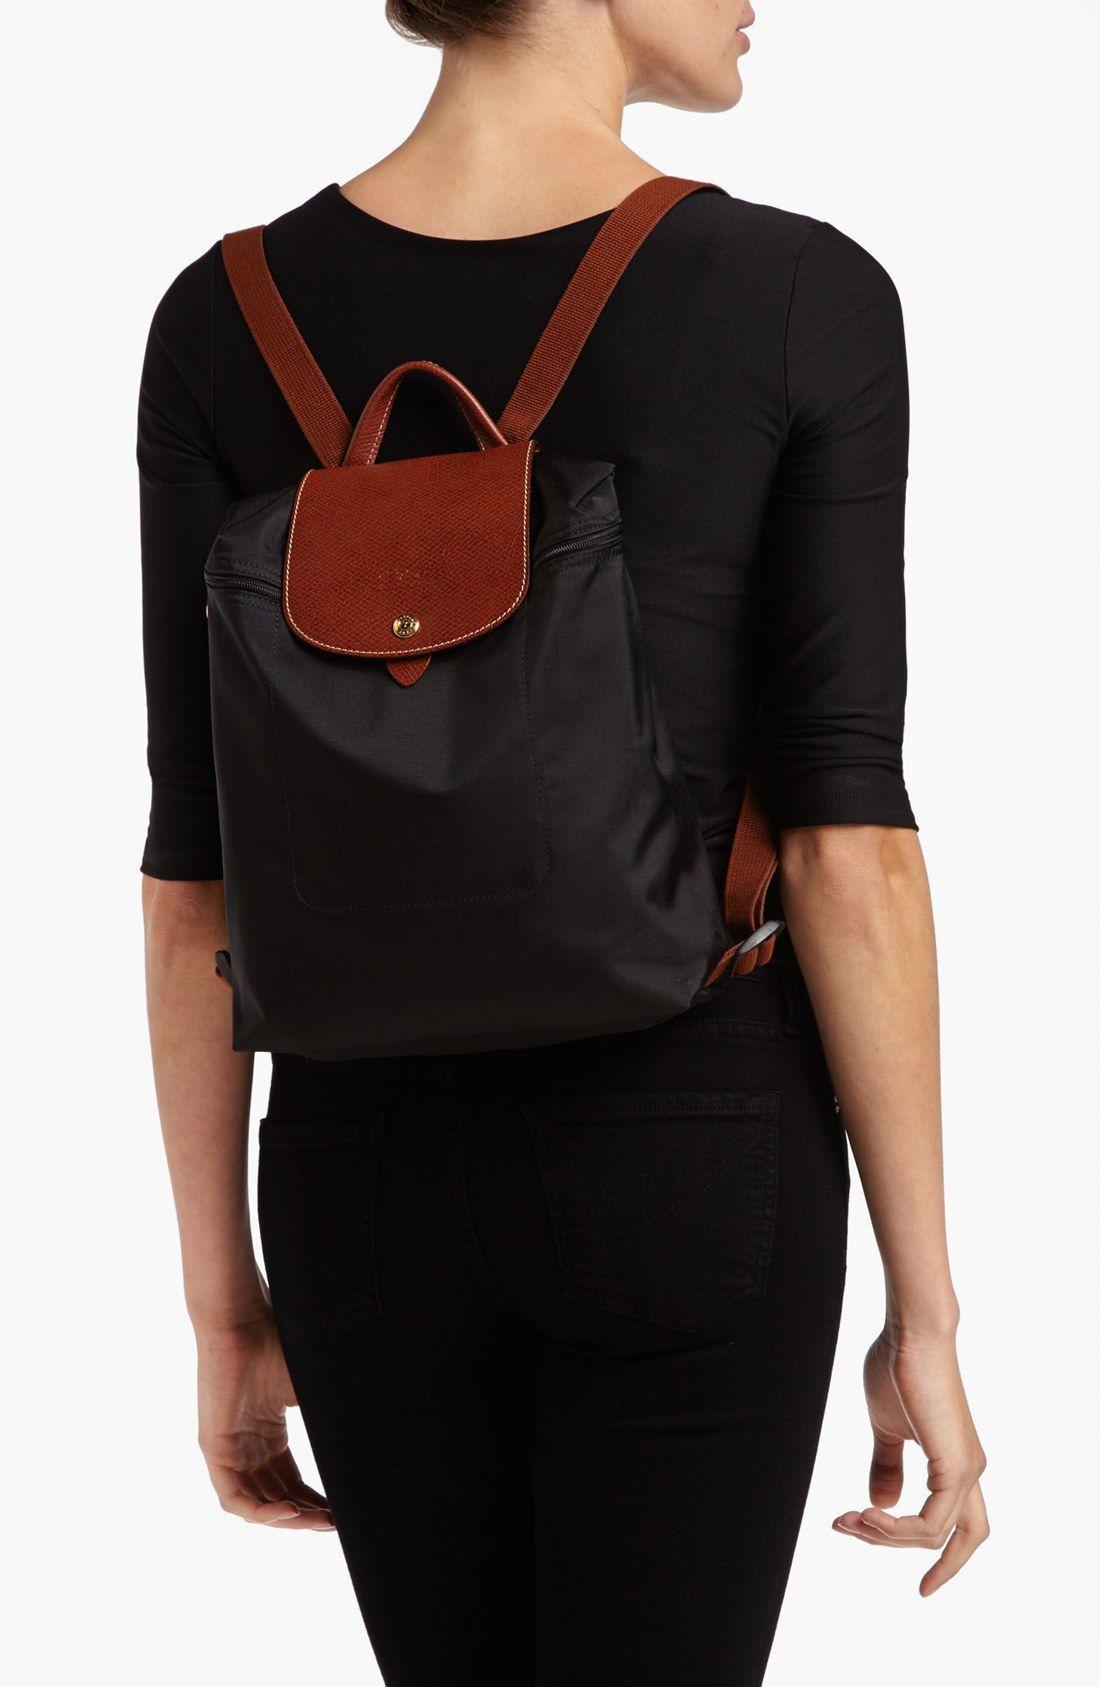 39 le pliage 39 backpack longchamp backpacks and brown. Black Bedroom Furniture Sets. Home Design Ideas